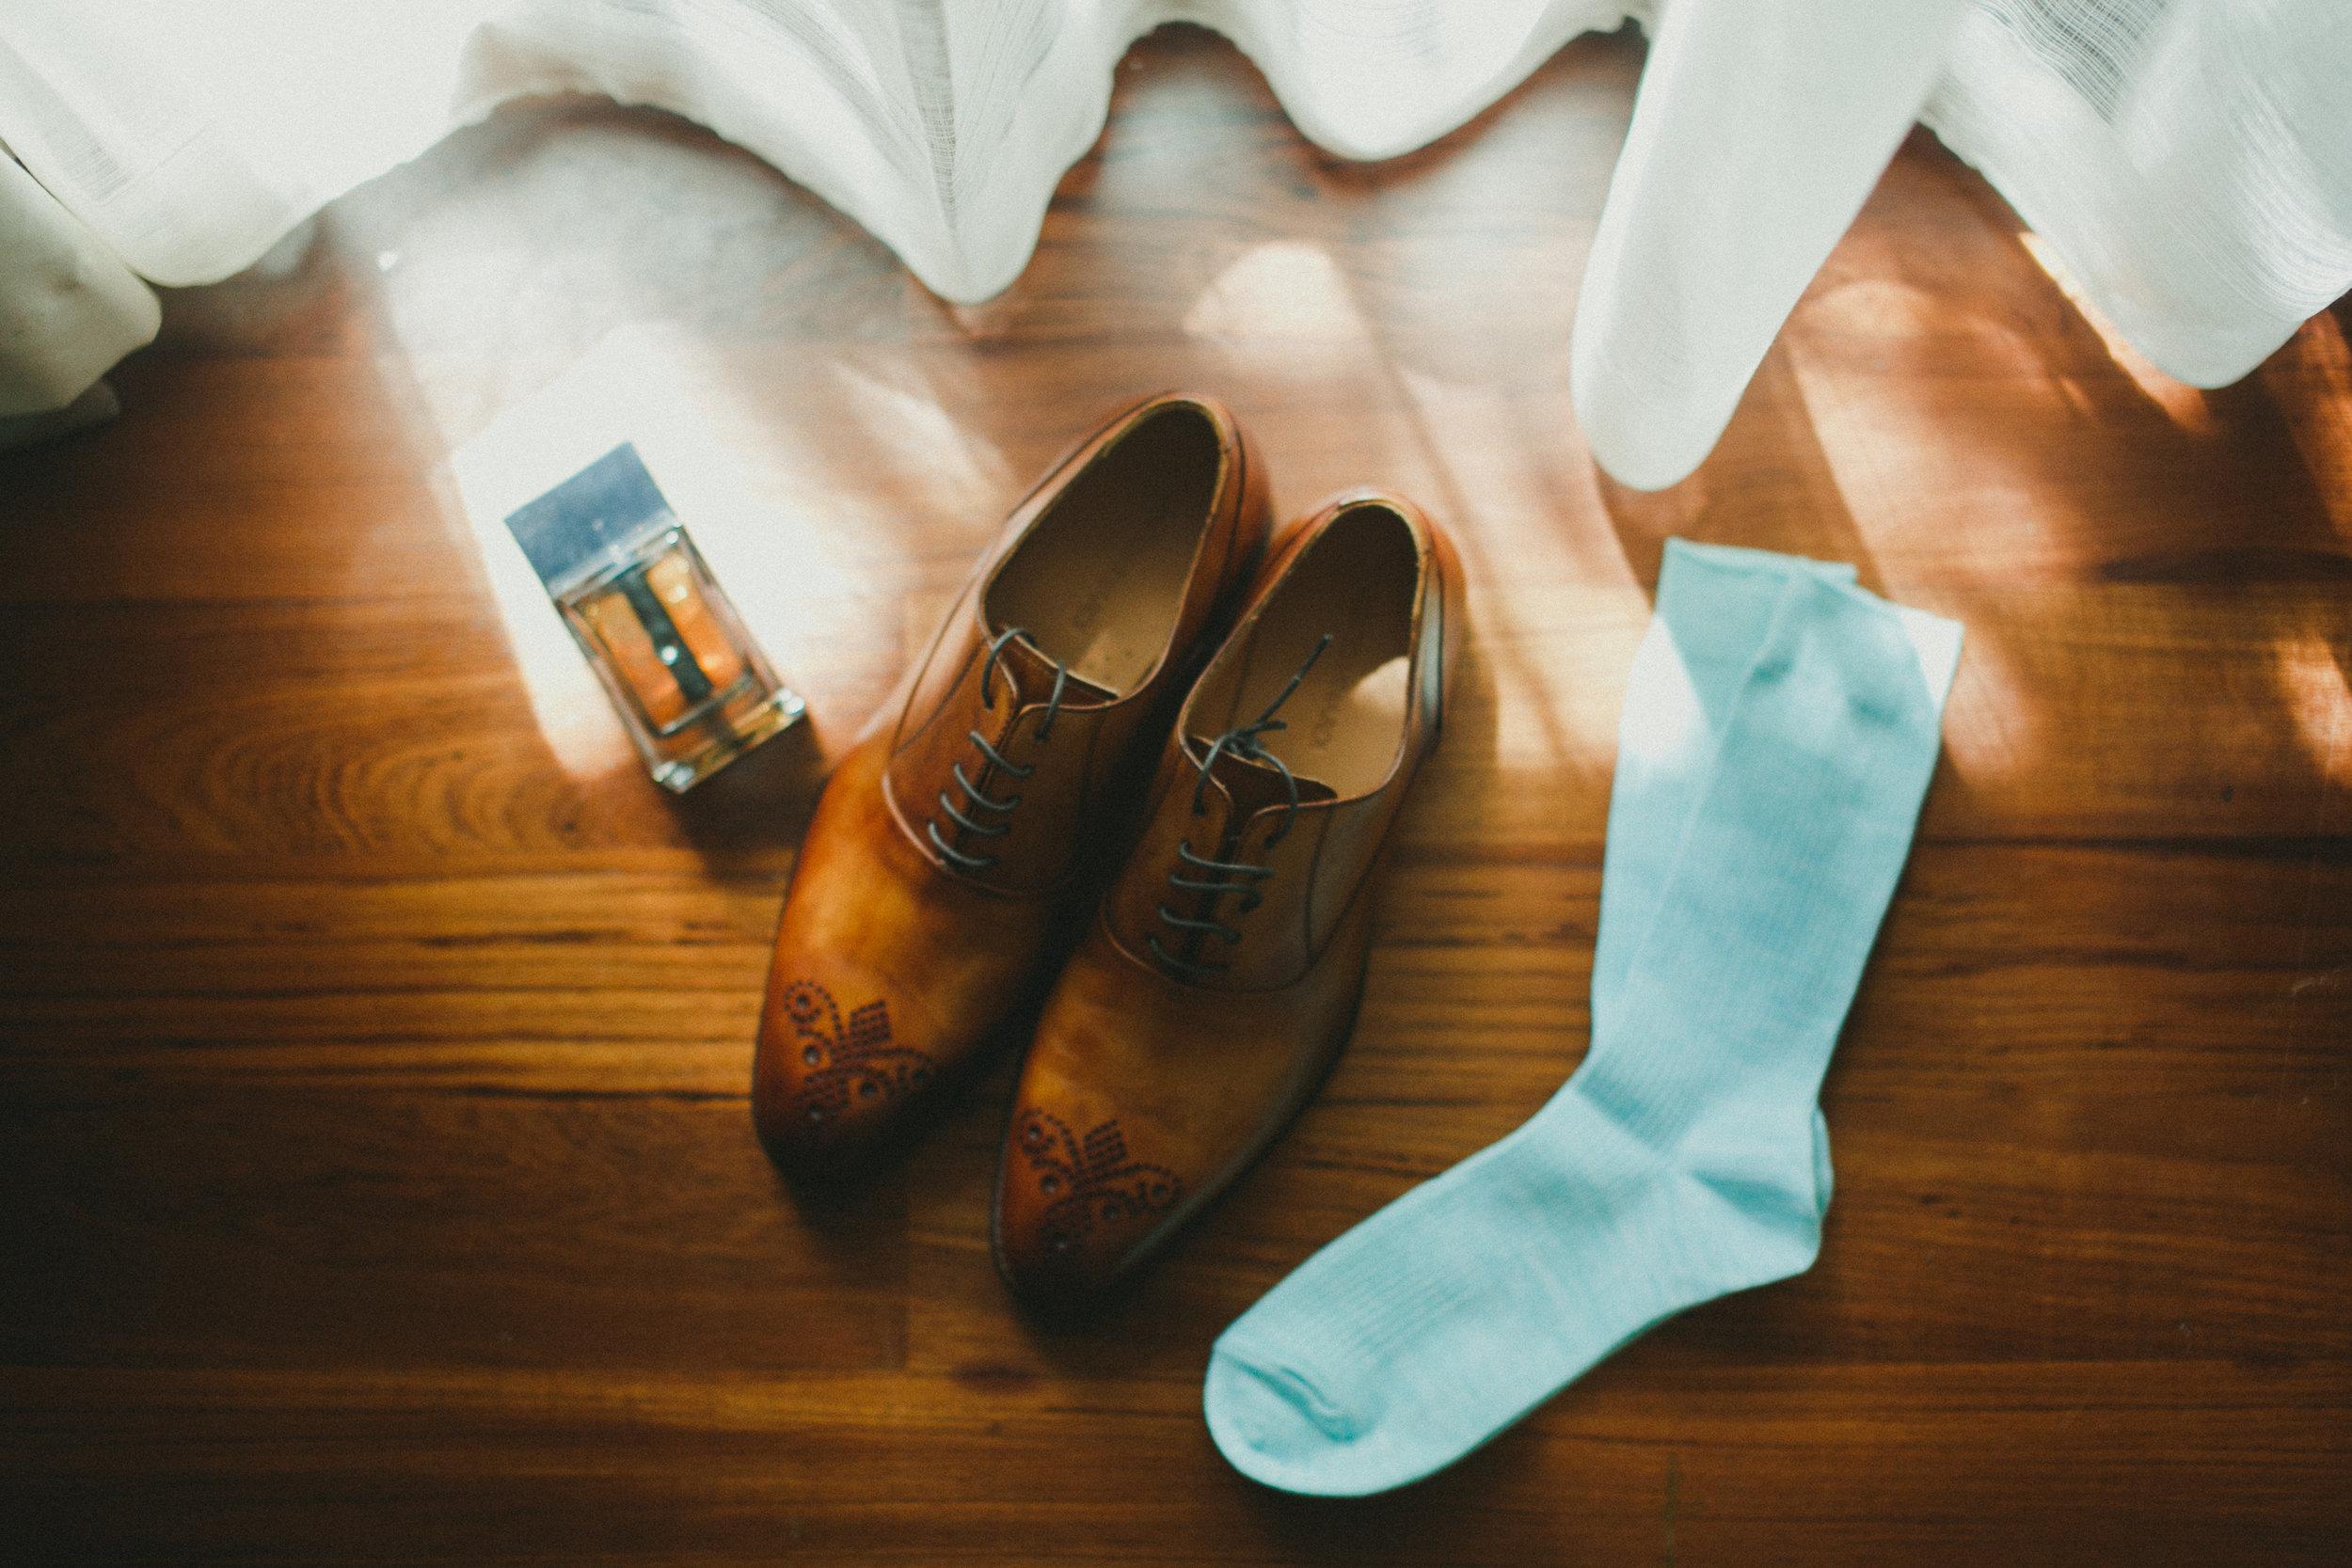 shoes  mario minardi  eau  perfume by dior homme  socks  uniqlo